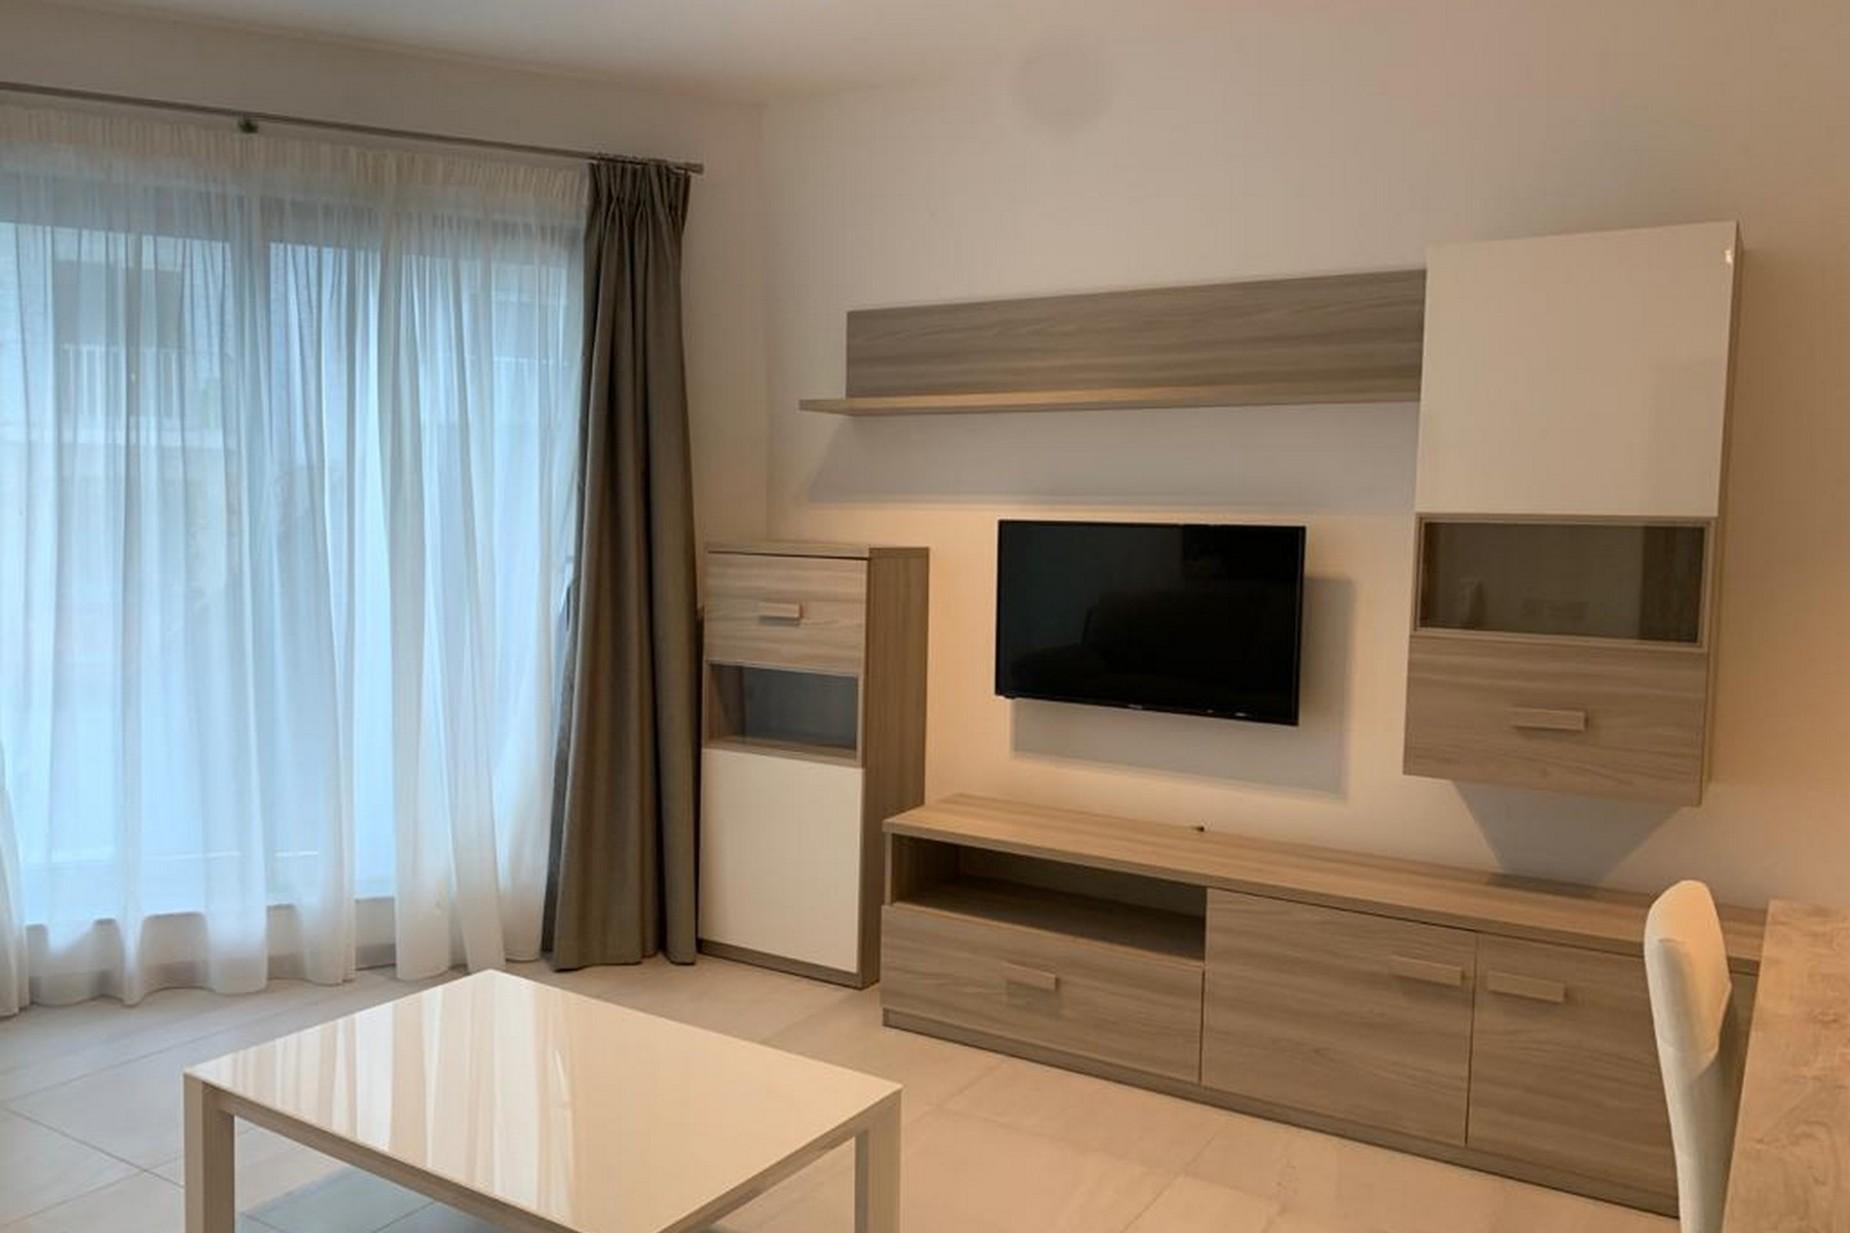 2 bed Maisonette For Rent in Swieqi, Swieqi - thumb 3